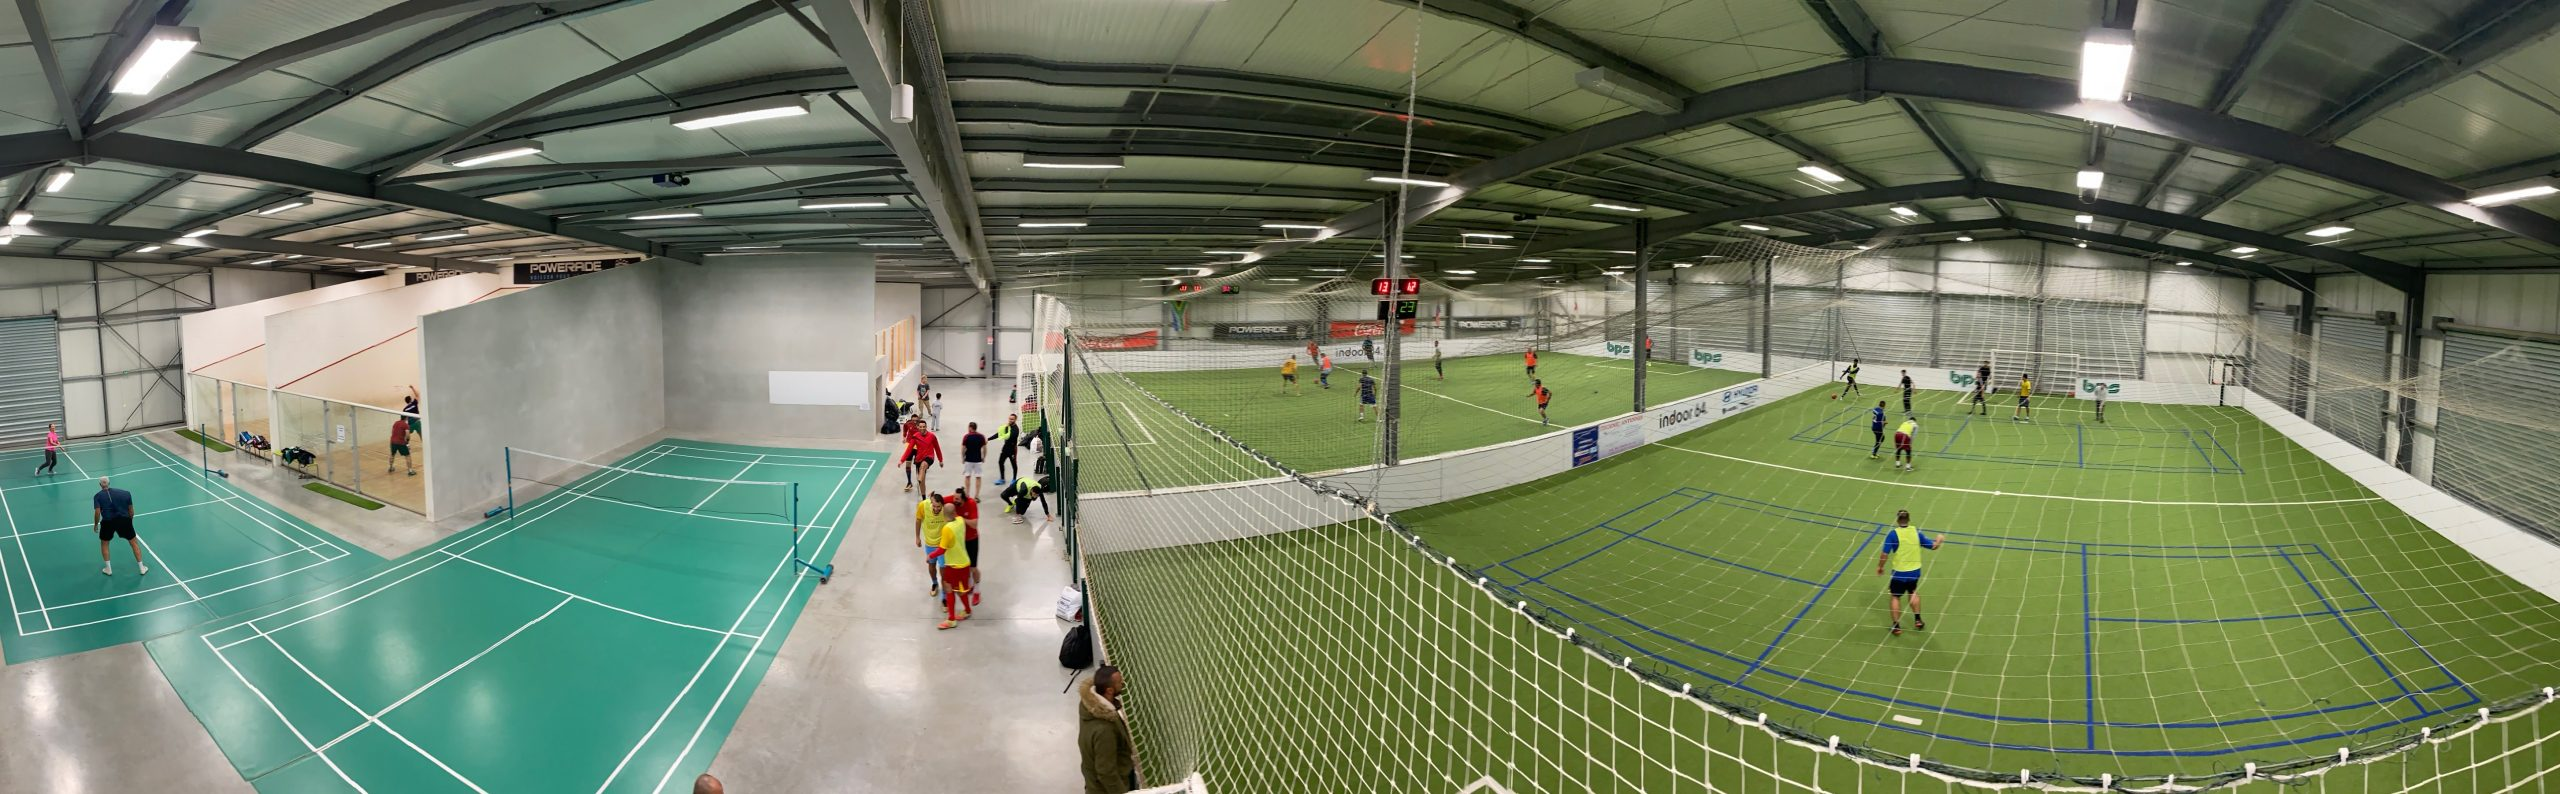 sport indoor 64 Pau Lescar